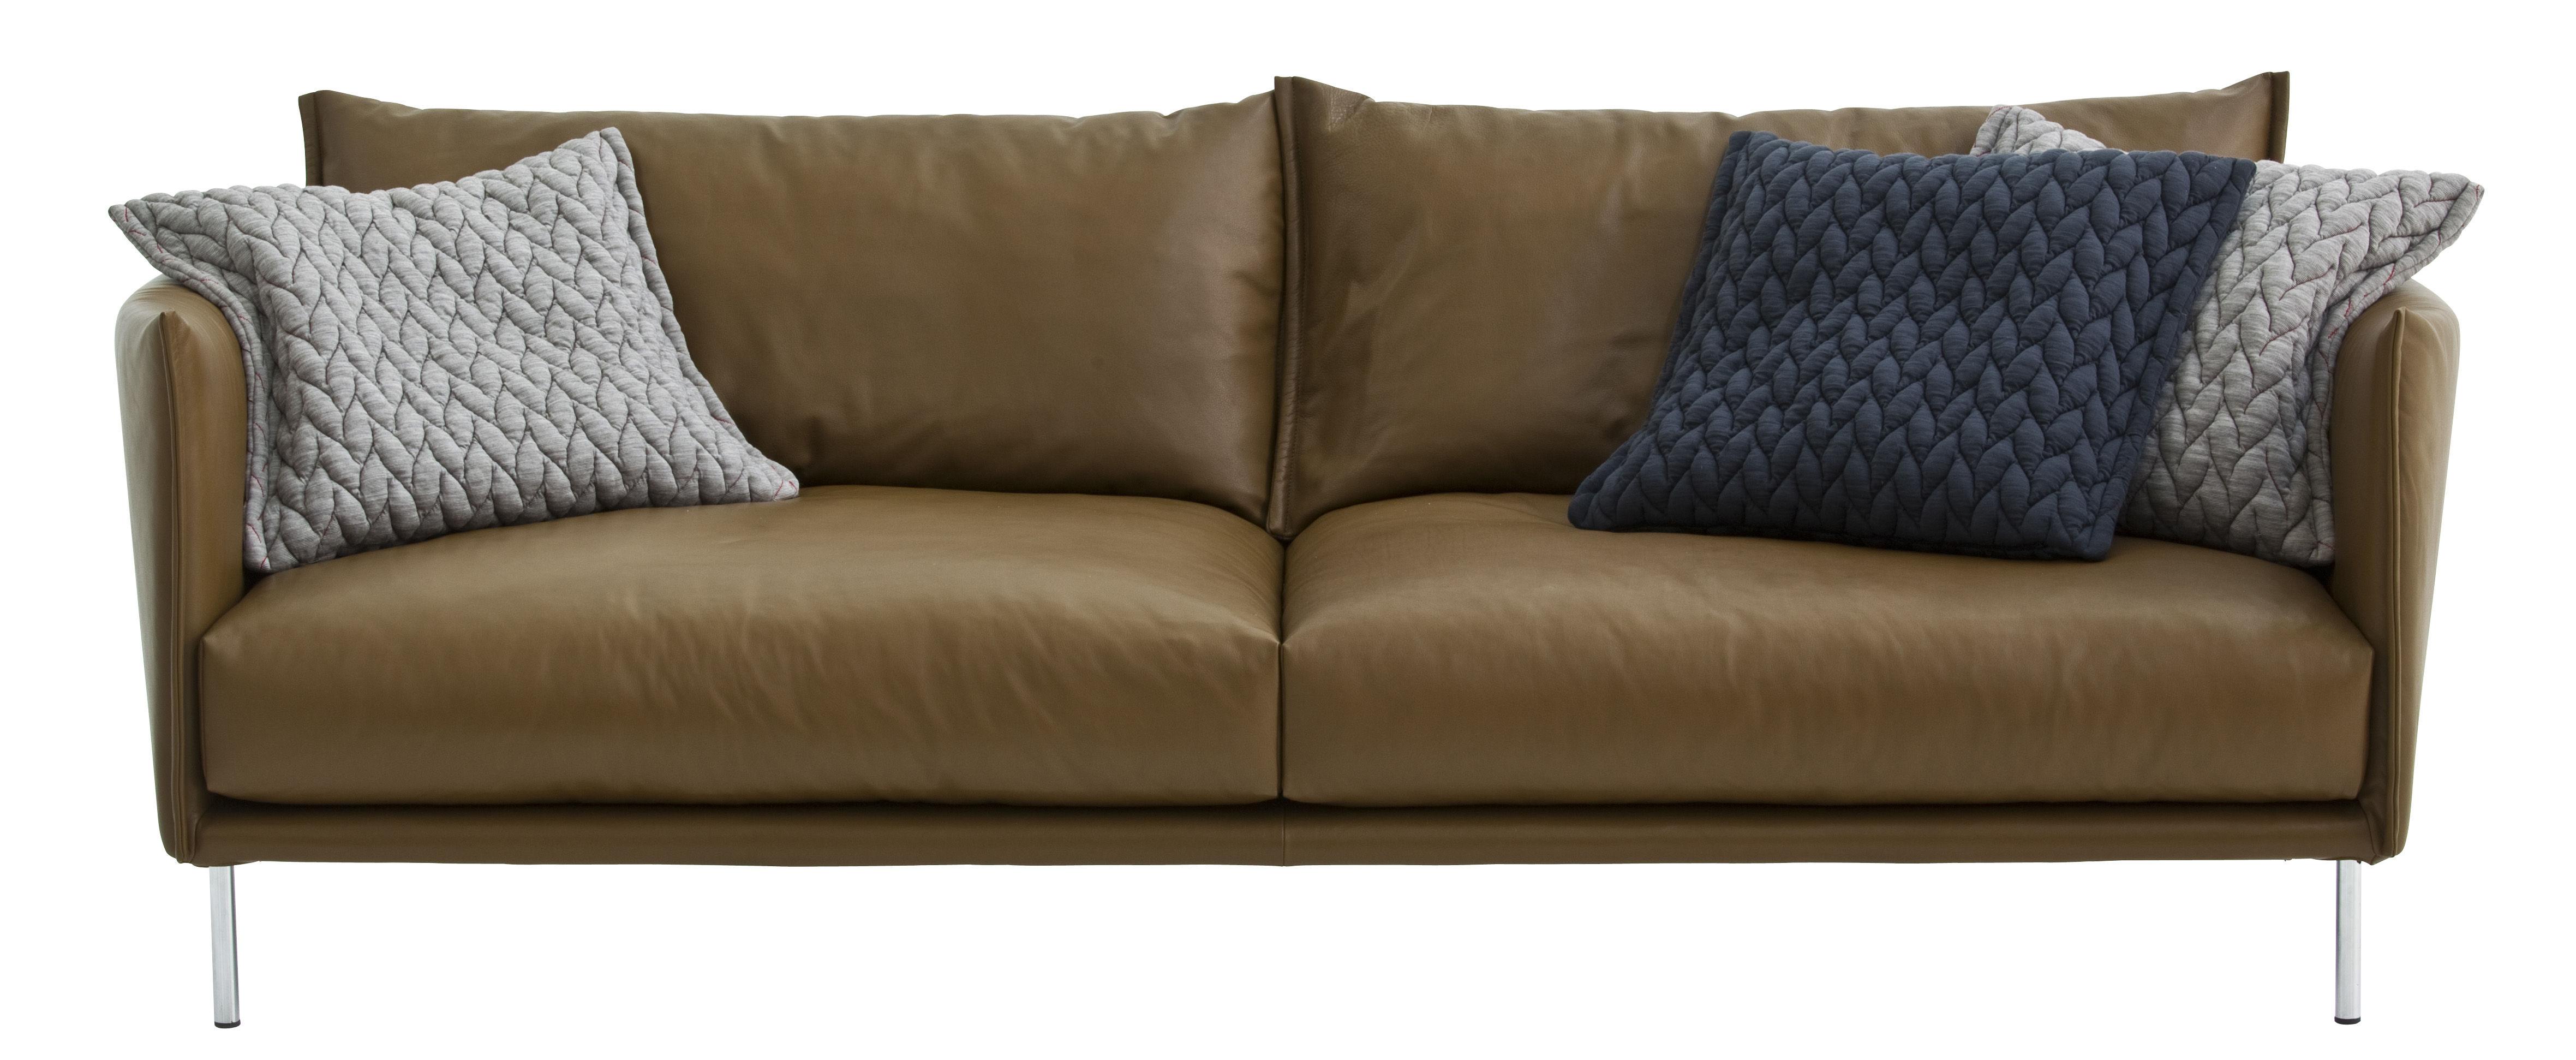 Möbel - Sofas - Gentry Sofa / L 240 cm - mit Lederbezug - Moroso - Braunes Leder, gewachst / Füße aus Chromstahl - Gänsedaune, lackierter Stahl, Leder, Polyurethan-Schaum